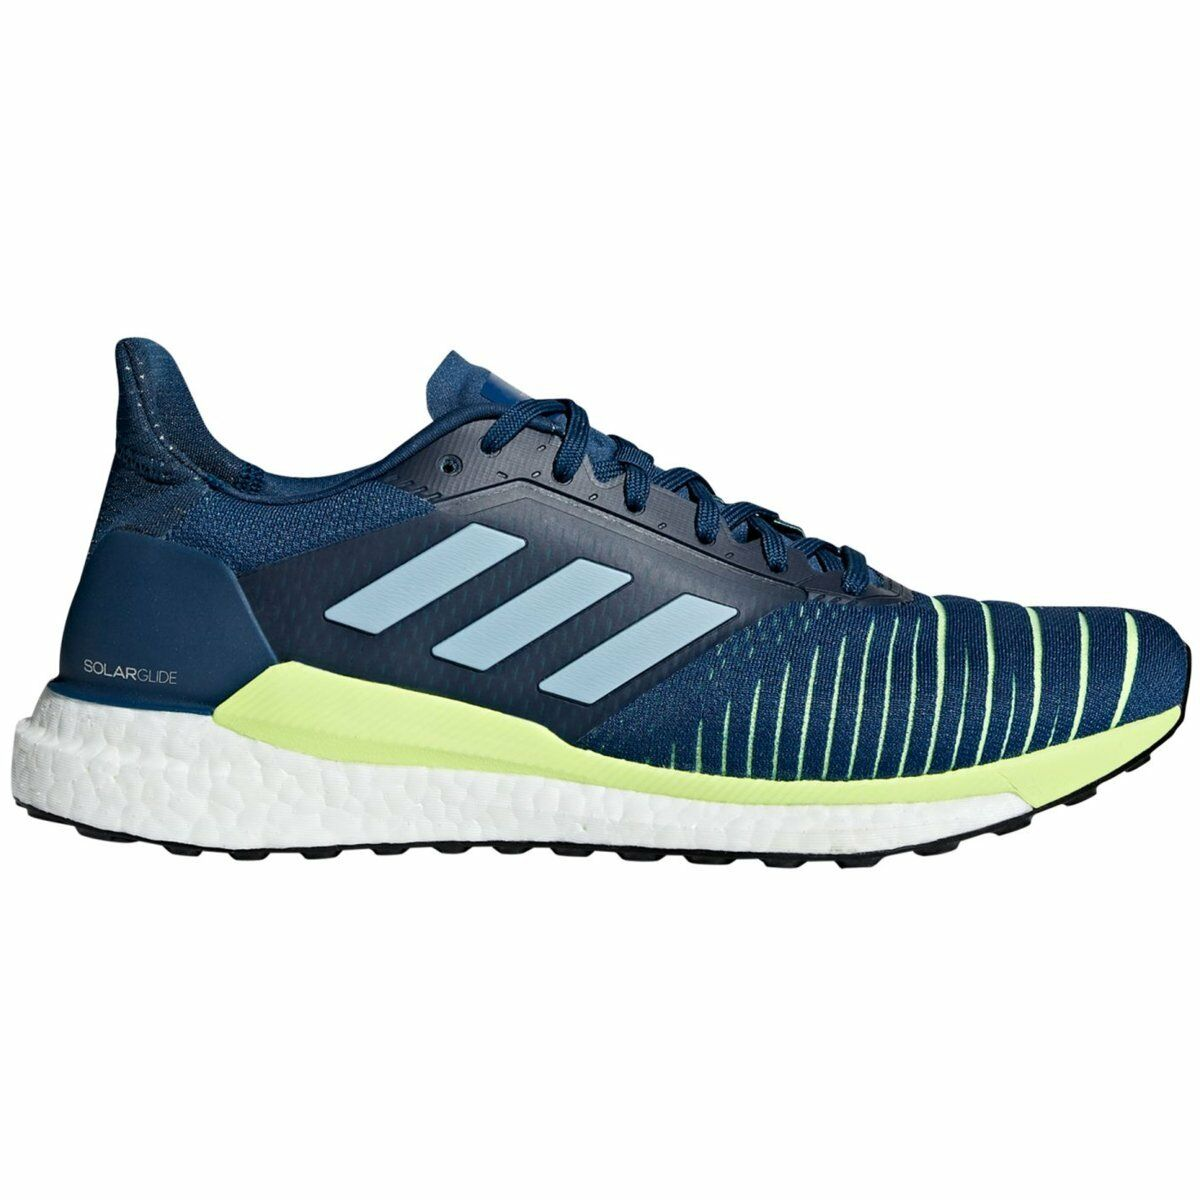 #S2K adidas Herren Sportschuhe Solar Glide Laufschuhe D97436 blau 588963